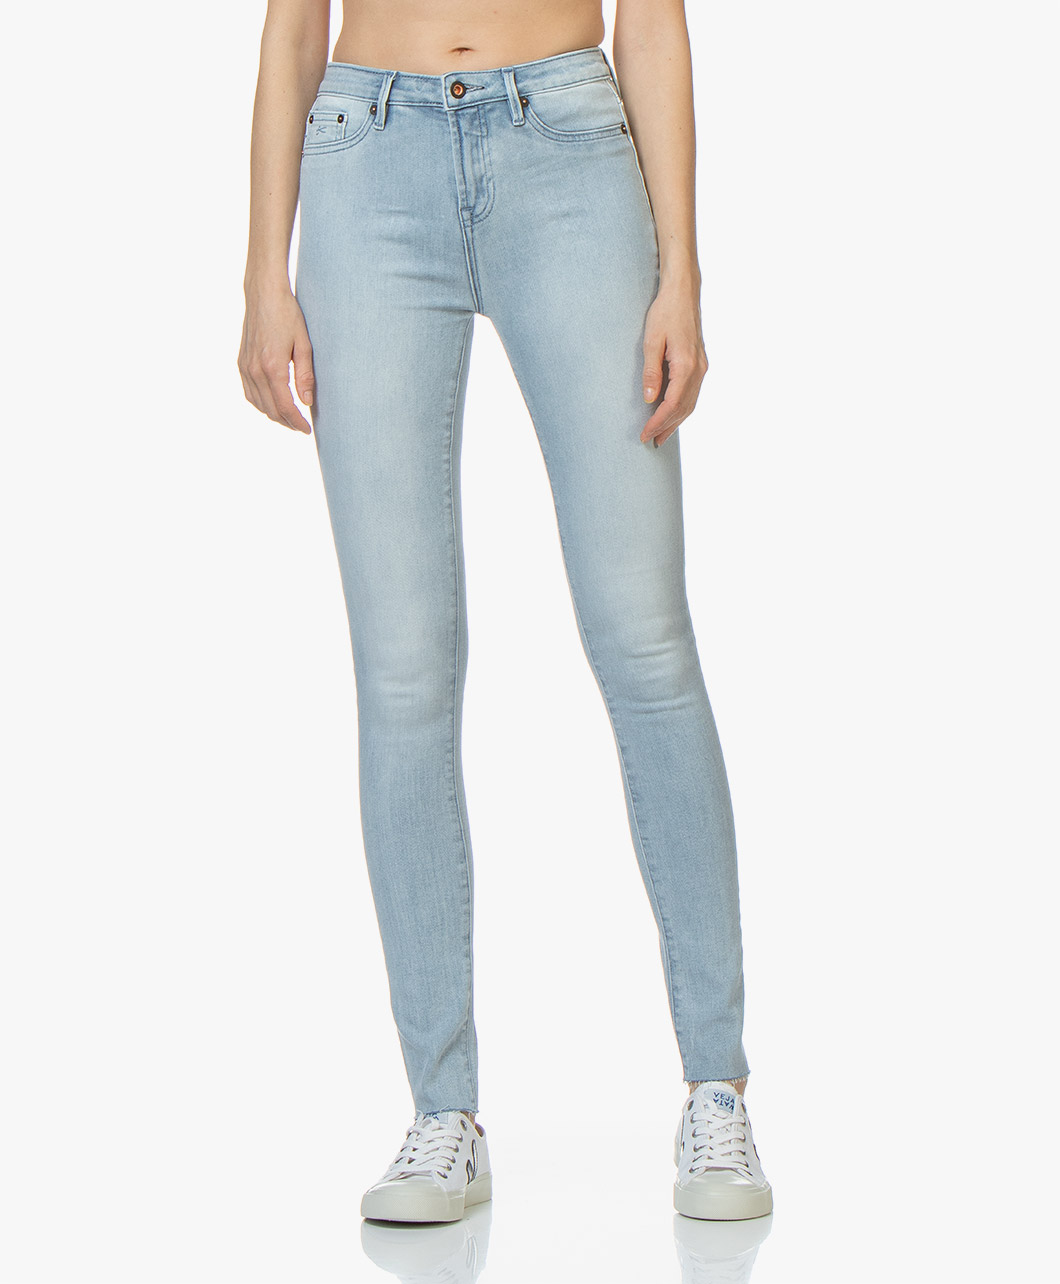 Afbeelding van Denham Jeans Lichtblauw Needle High Skinny